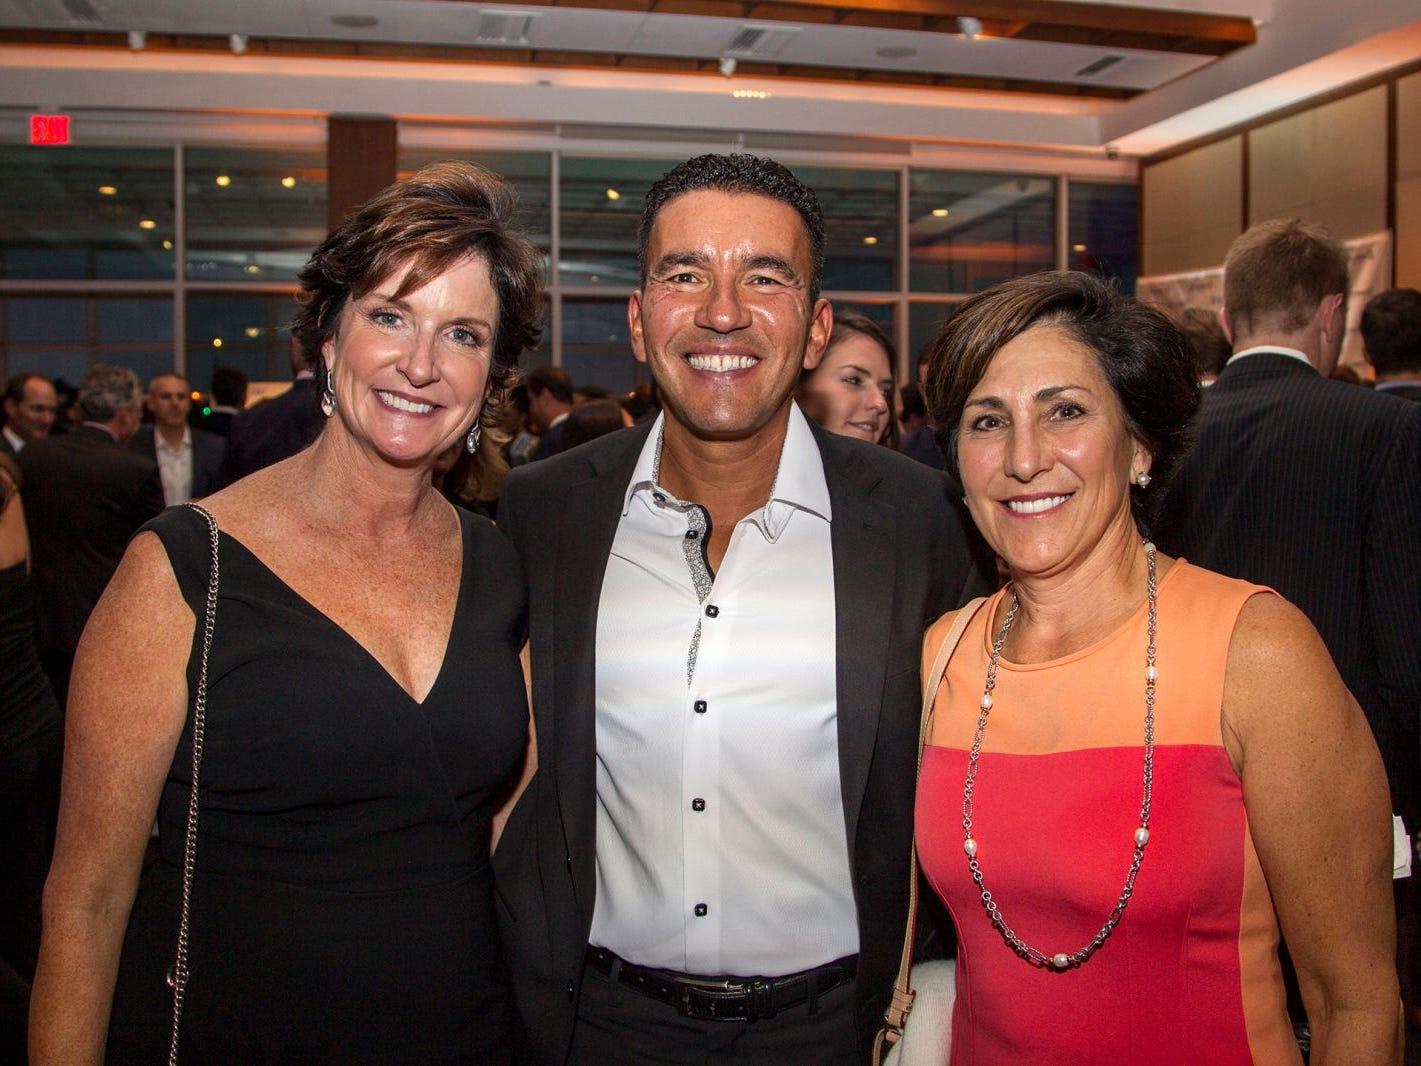 Malan Foran, Laurent Lafontant, Sue Durfee. 11th annual IronMatt Fundraiser Gala at Pier 60 Chelsea Piers. 09/20/2018